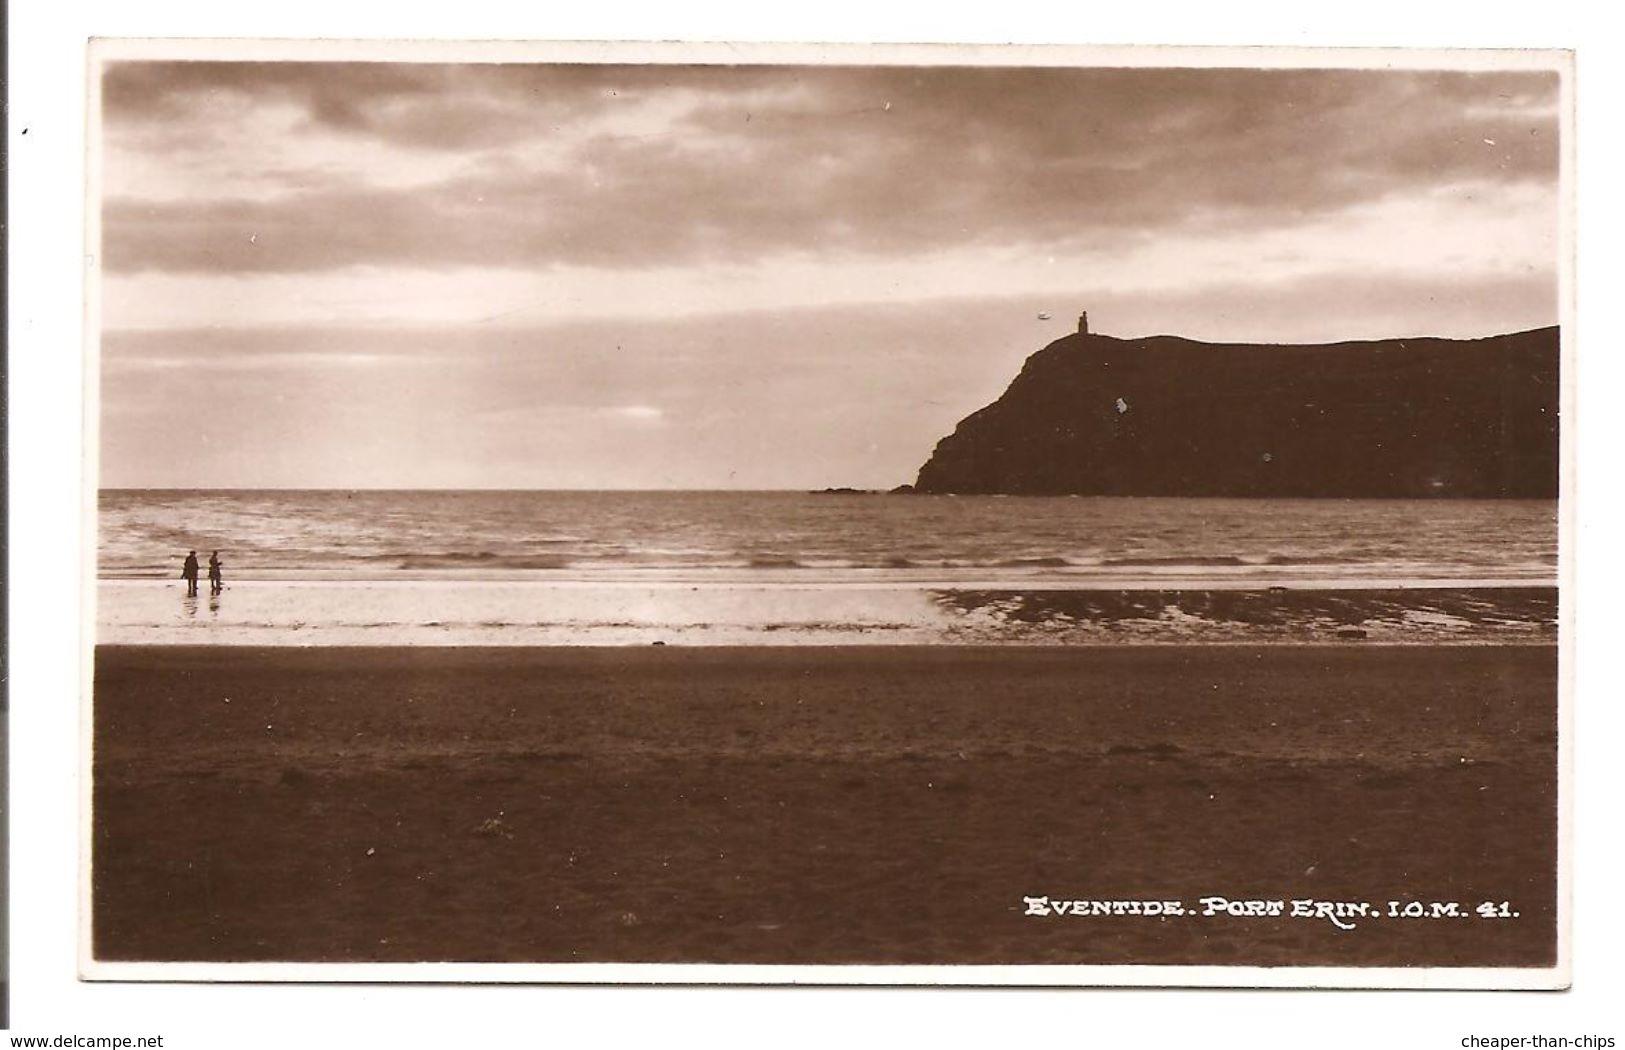 Eventide. Port Erin. - Bamforth I.O.M. 41 - Isle Of Man